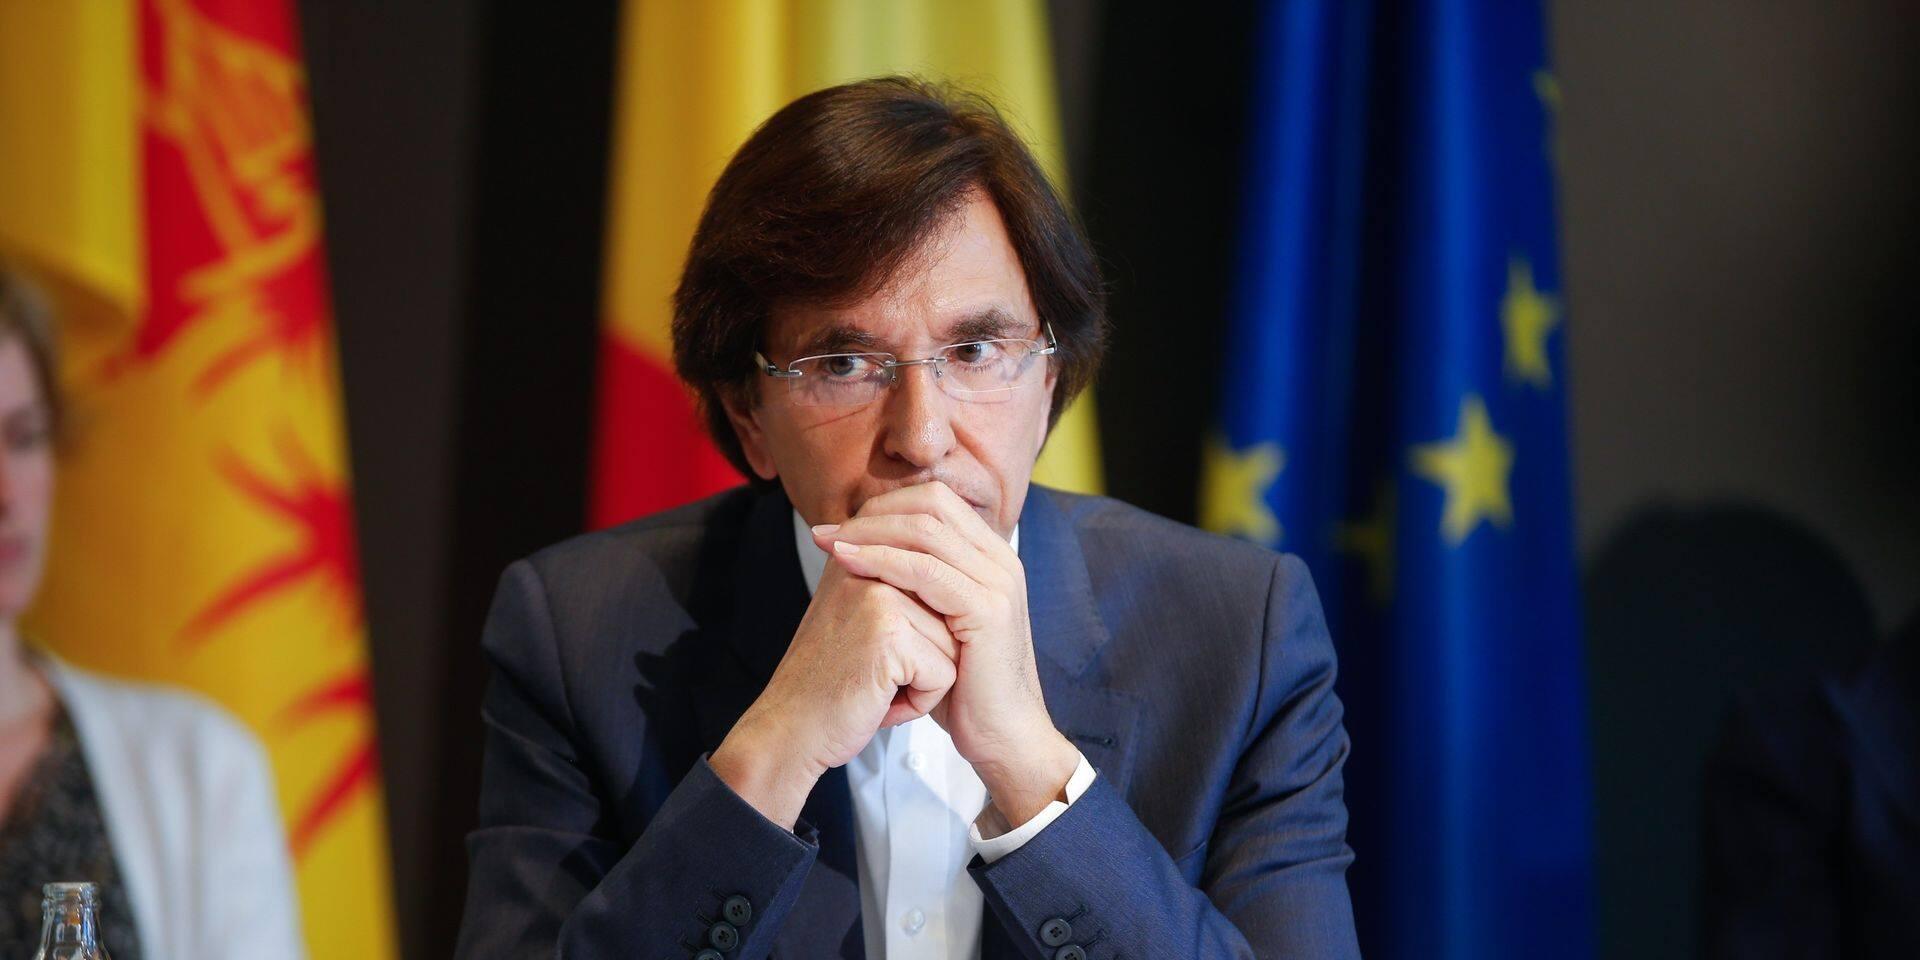 Le gouvernement Di Rupo s'accorde sur l'organisation du contact tracing en Wallonie